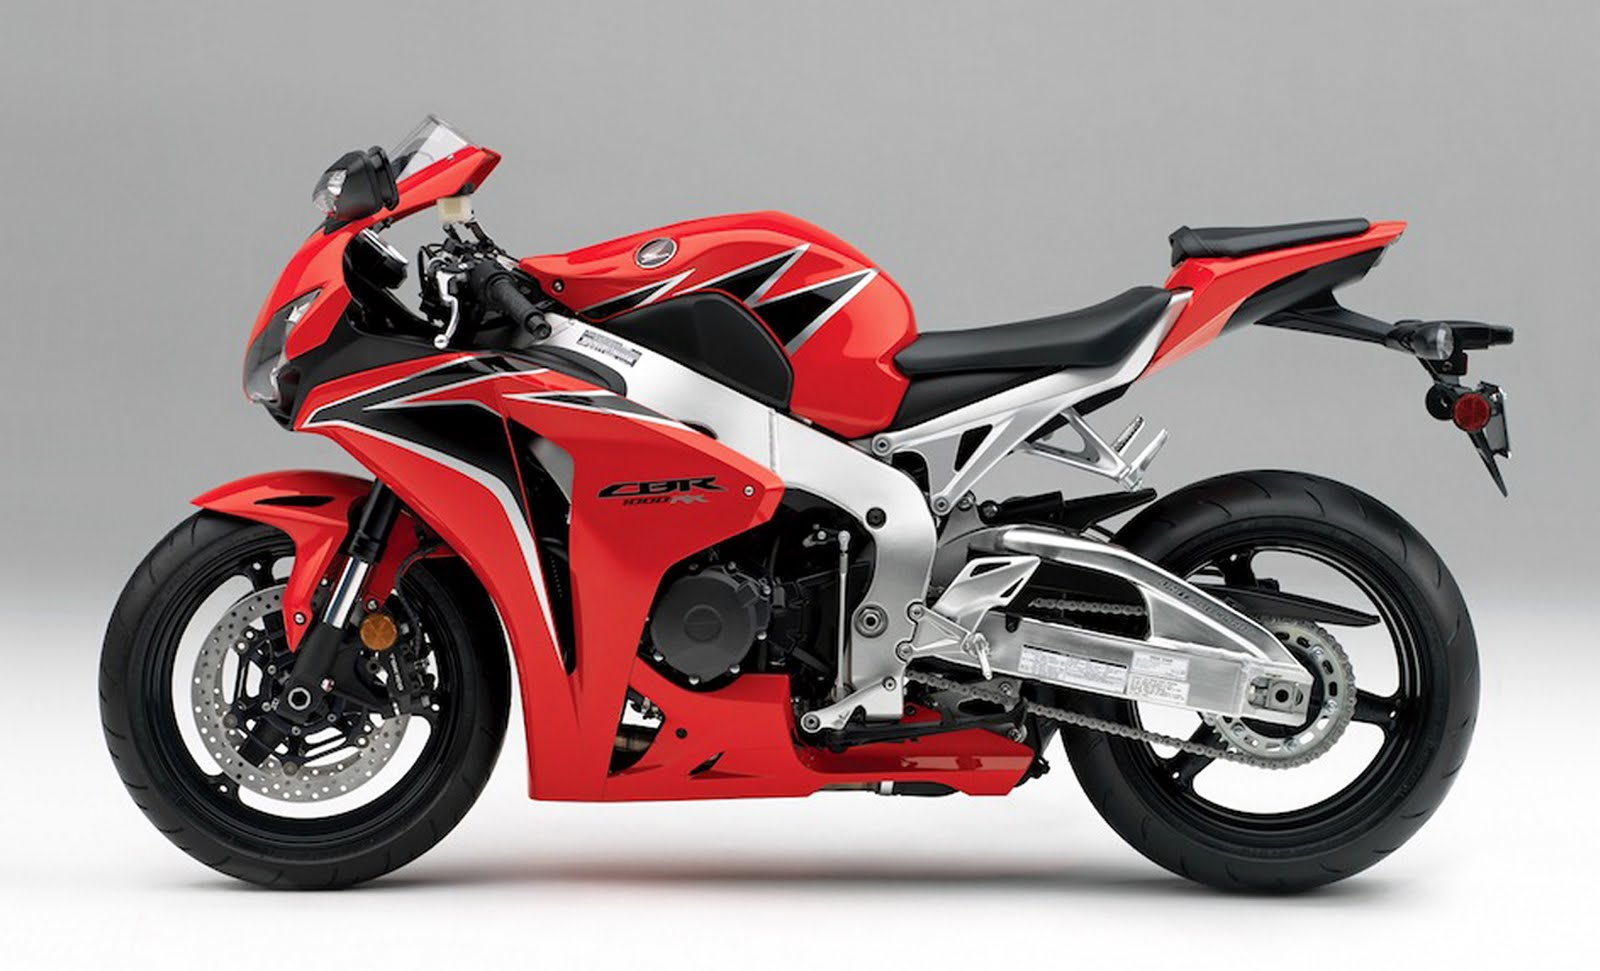 New Honda Cbr 1000rr Abs Read More